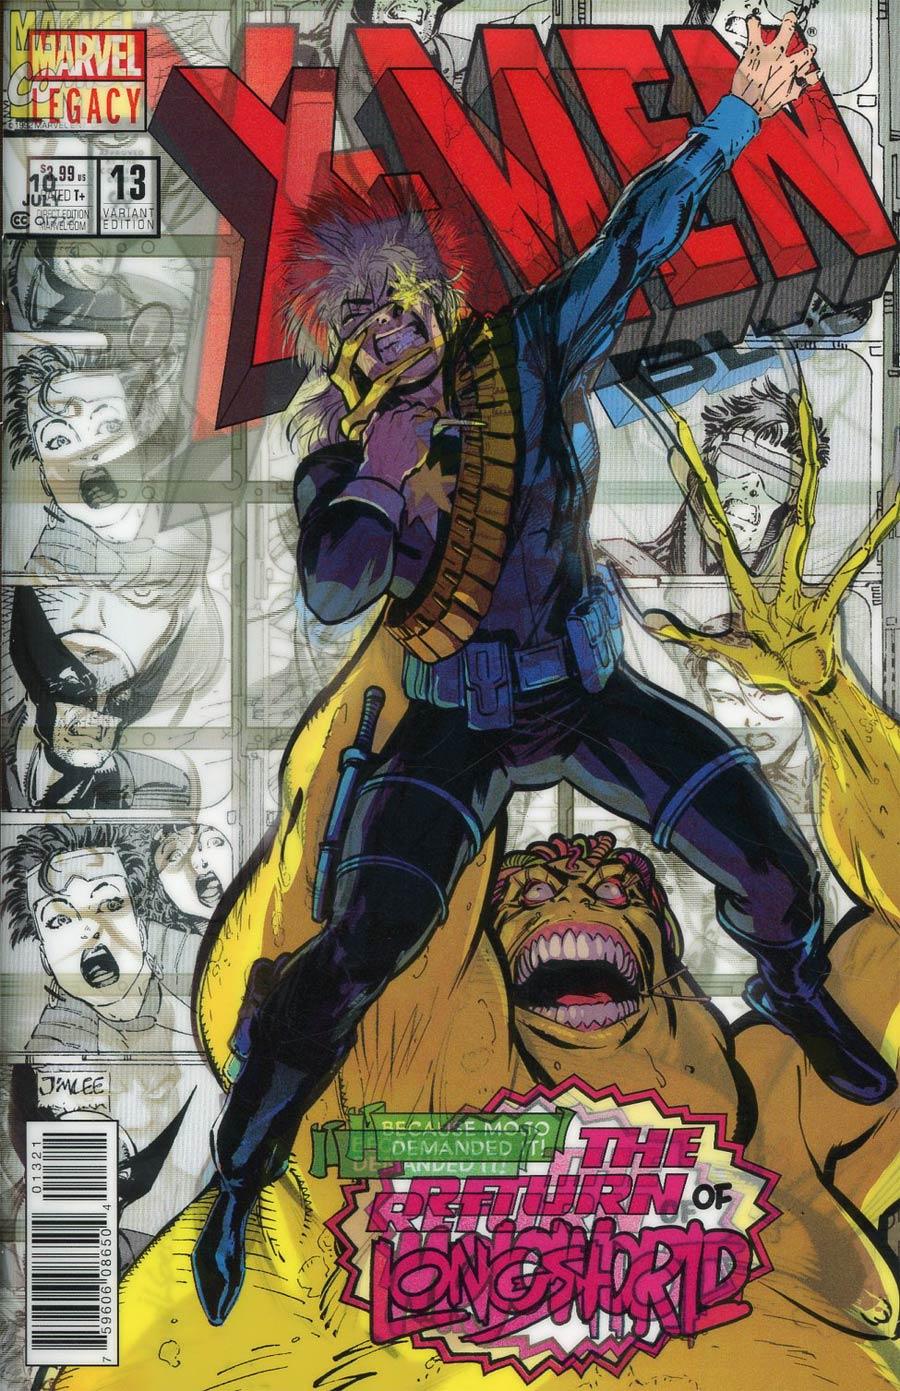 X-Men Blue #13 Cover B Variant David Lopez Lenticular Homage Cover (Mojo Worldwide Part 2)(Marvel Legacy Tie-In)